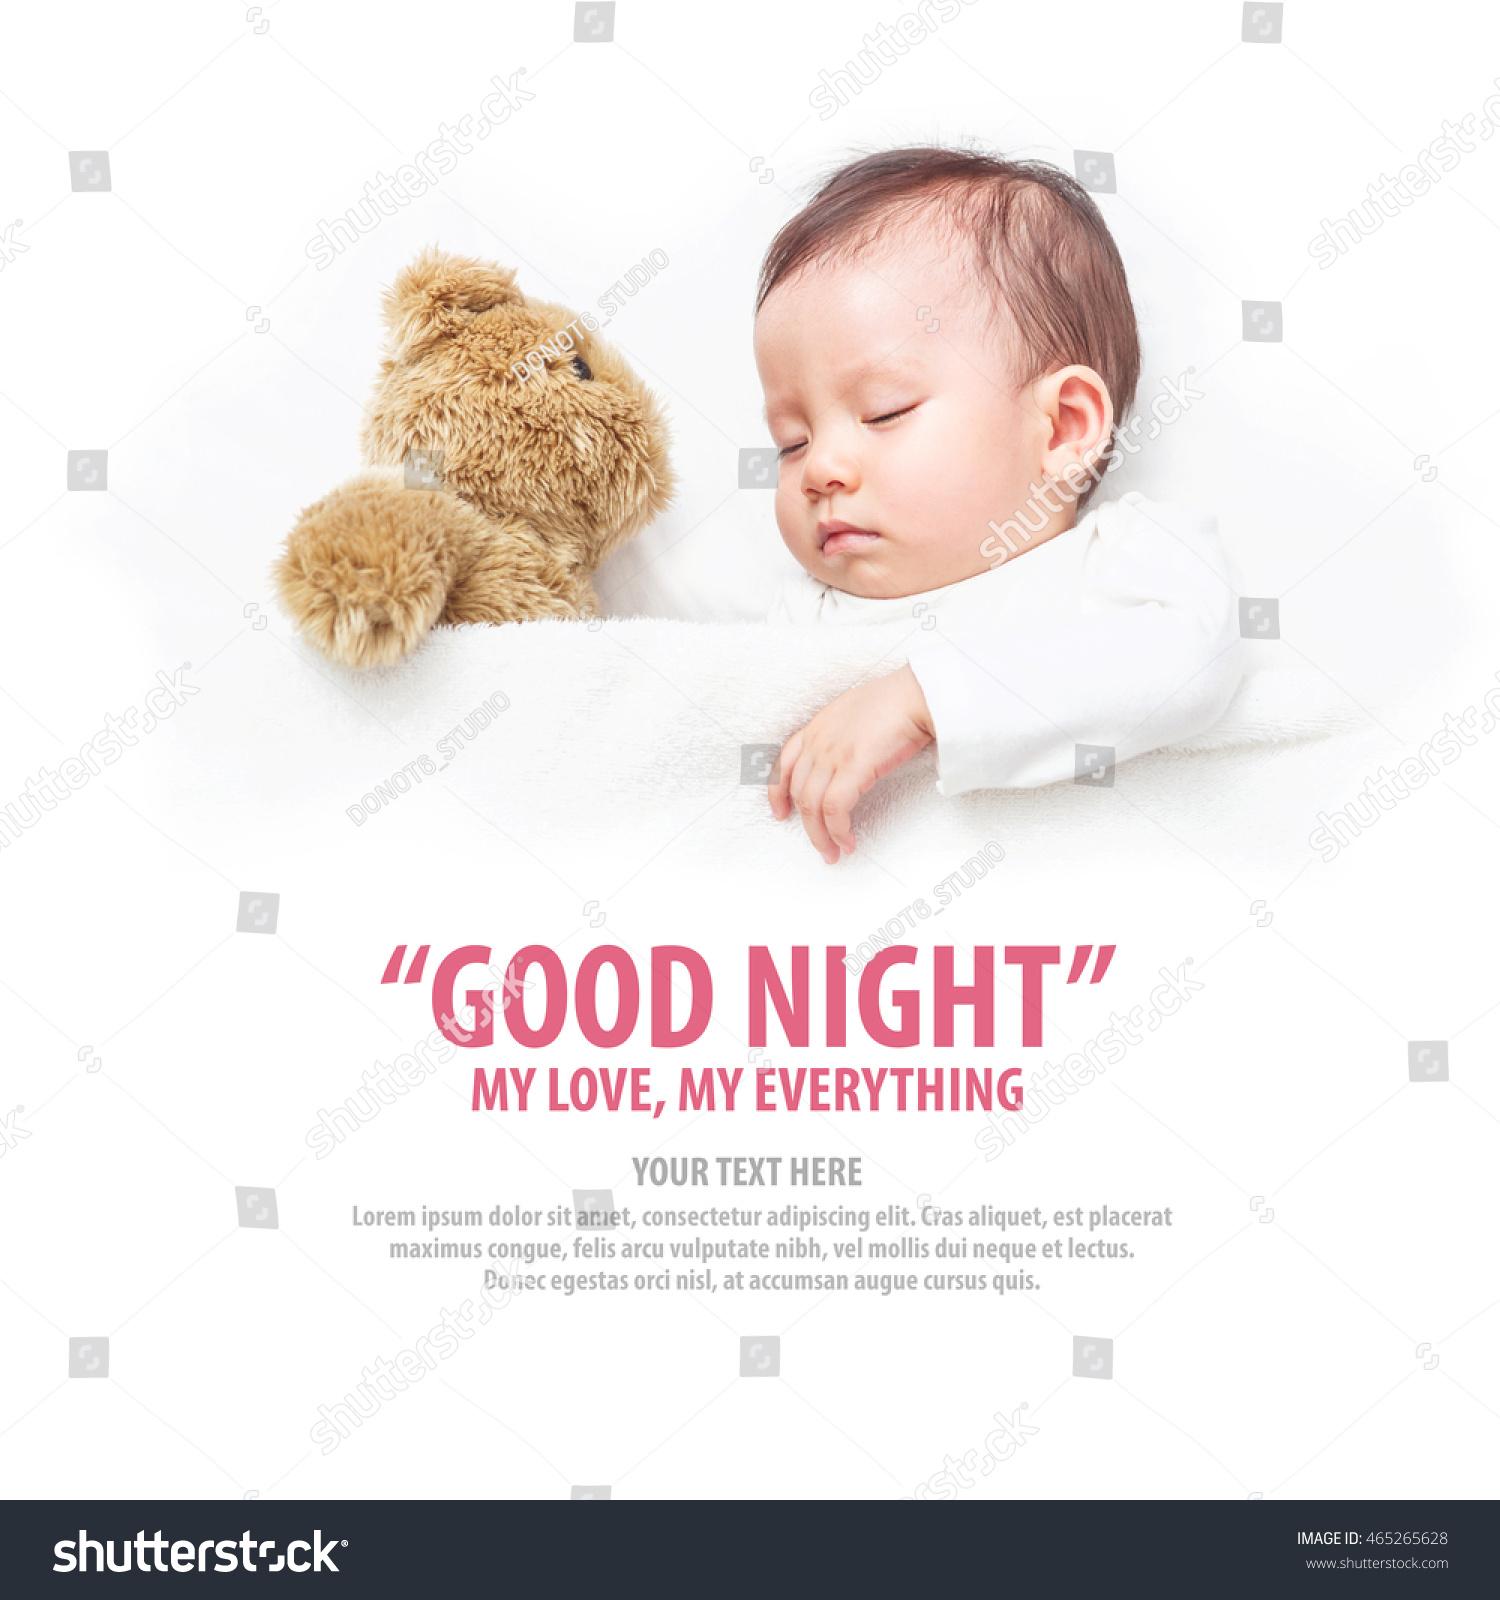 Asian Baby Sleeping Her Teddy Bear Stock Photo (Edit Now) 465265628